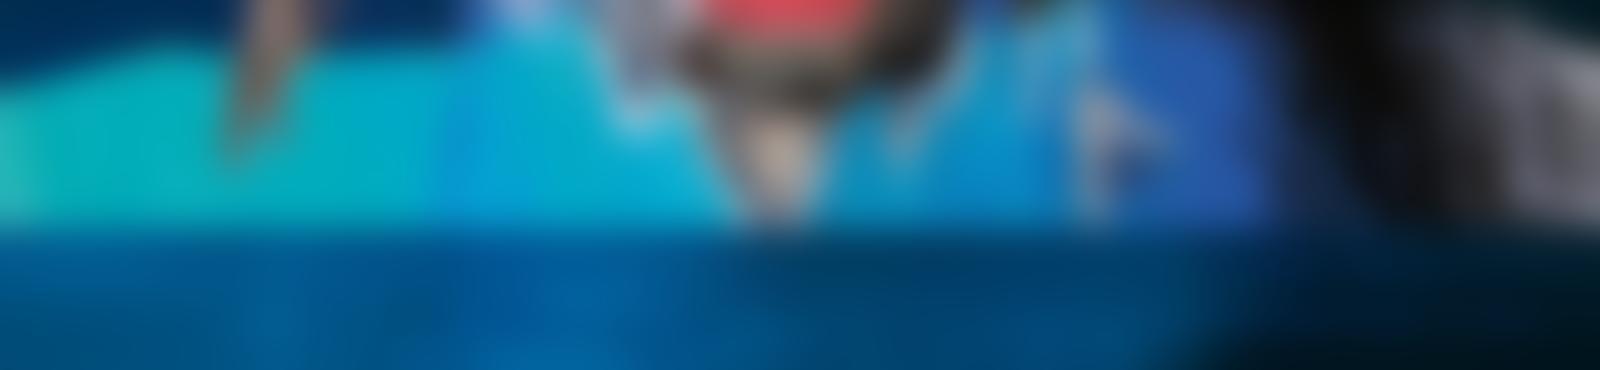 Blurred 8bcbb24d 6907 454d 8162 3910ae10deef